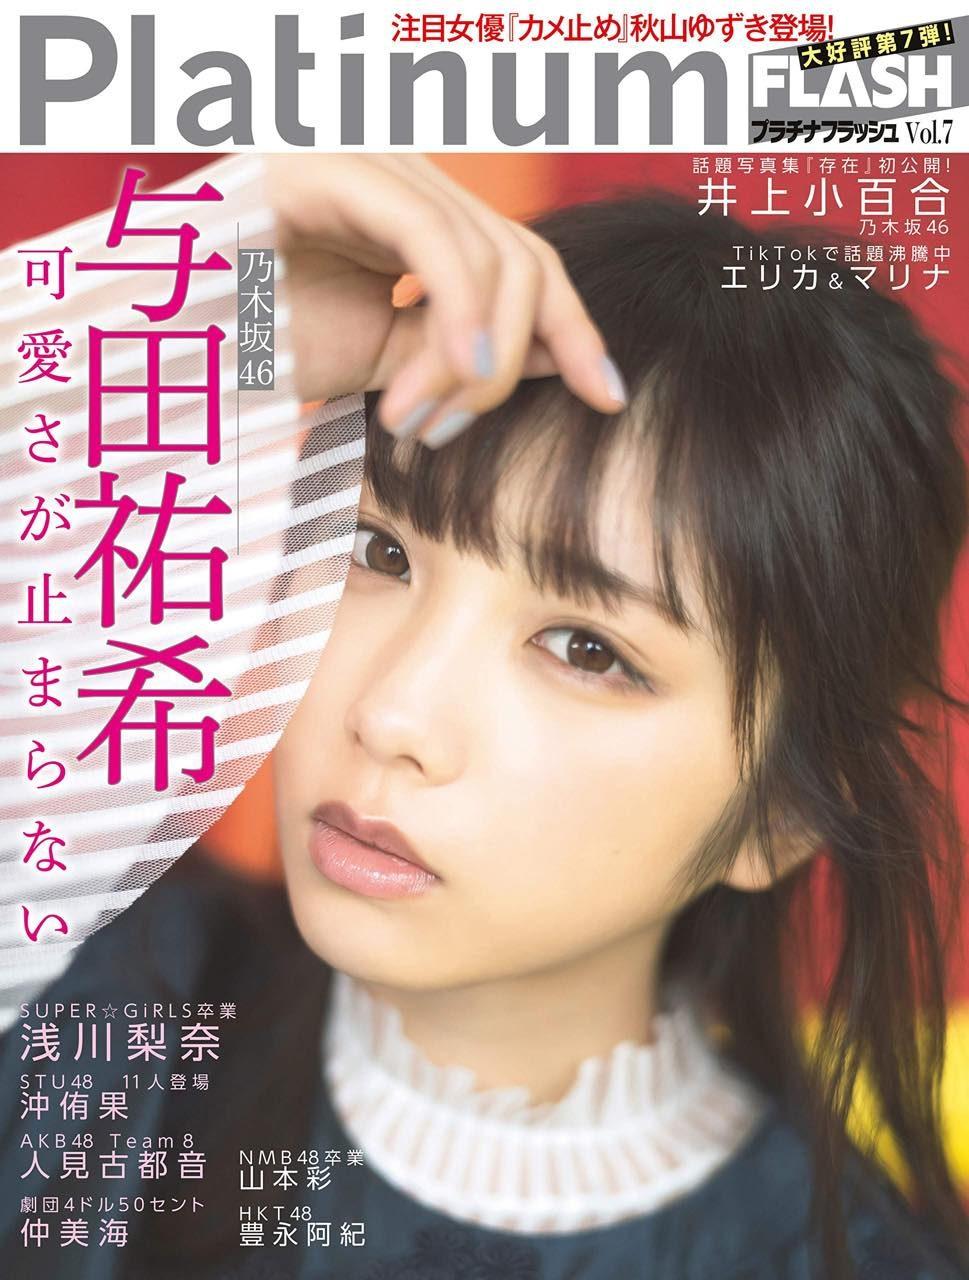 「Platinum FLASH vol.7」掲載:山本彩・豊永阿紀・沖侑果・人見古都音 [11/26発売]